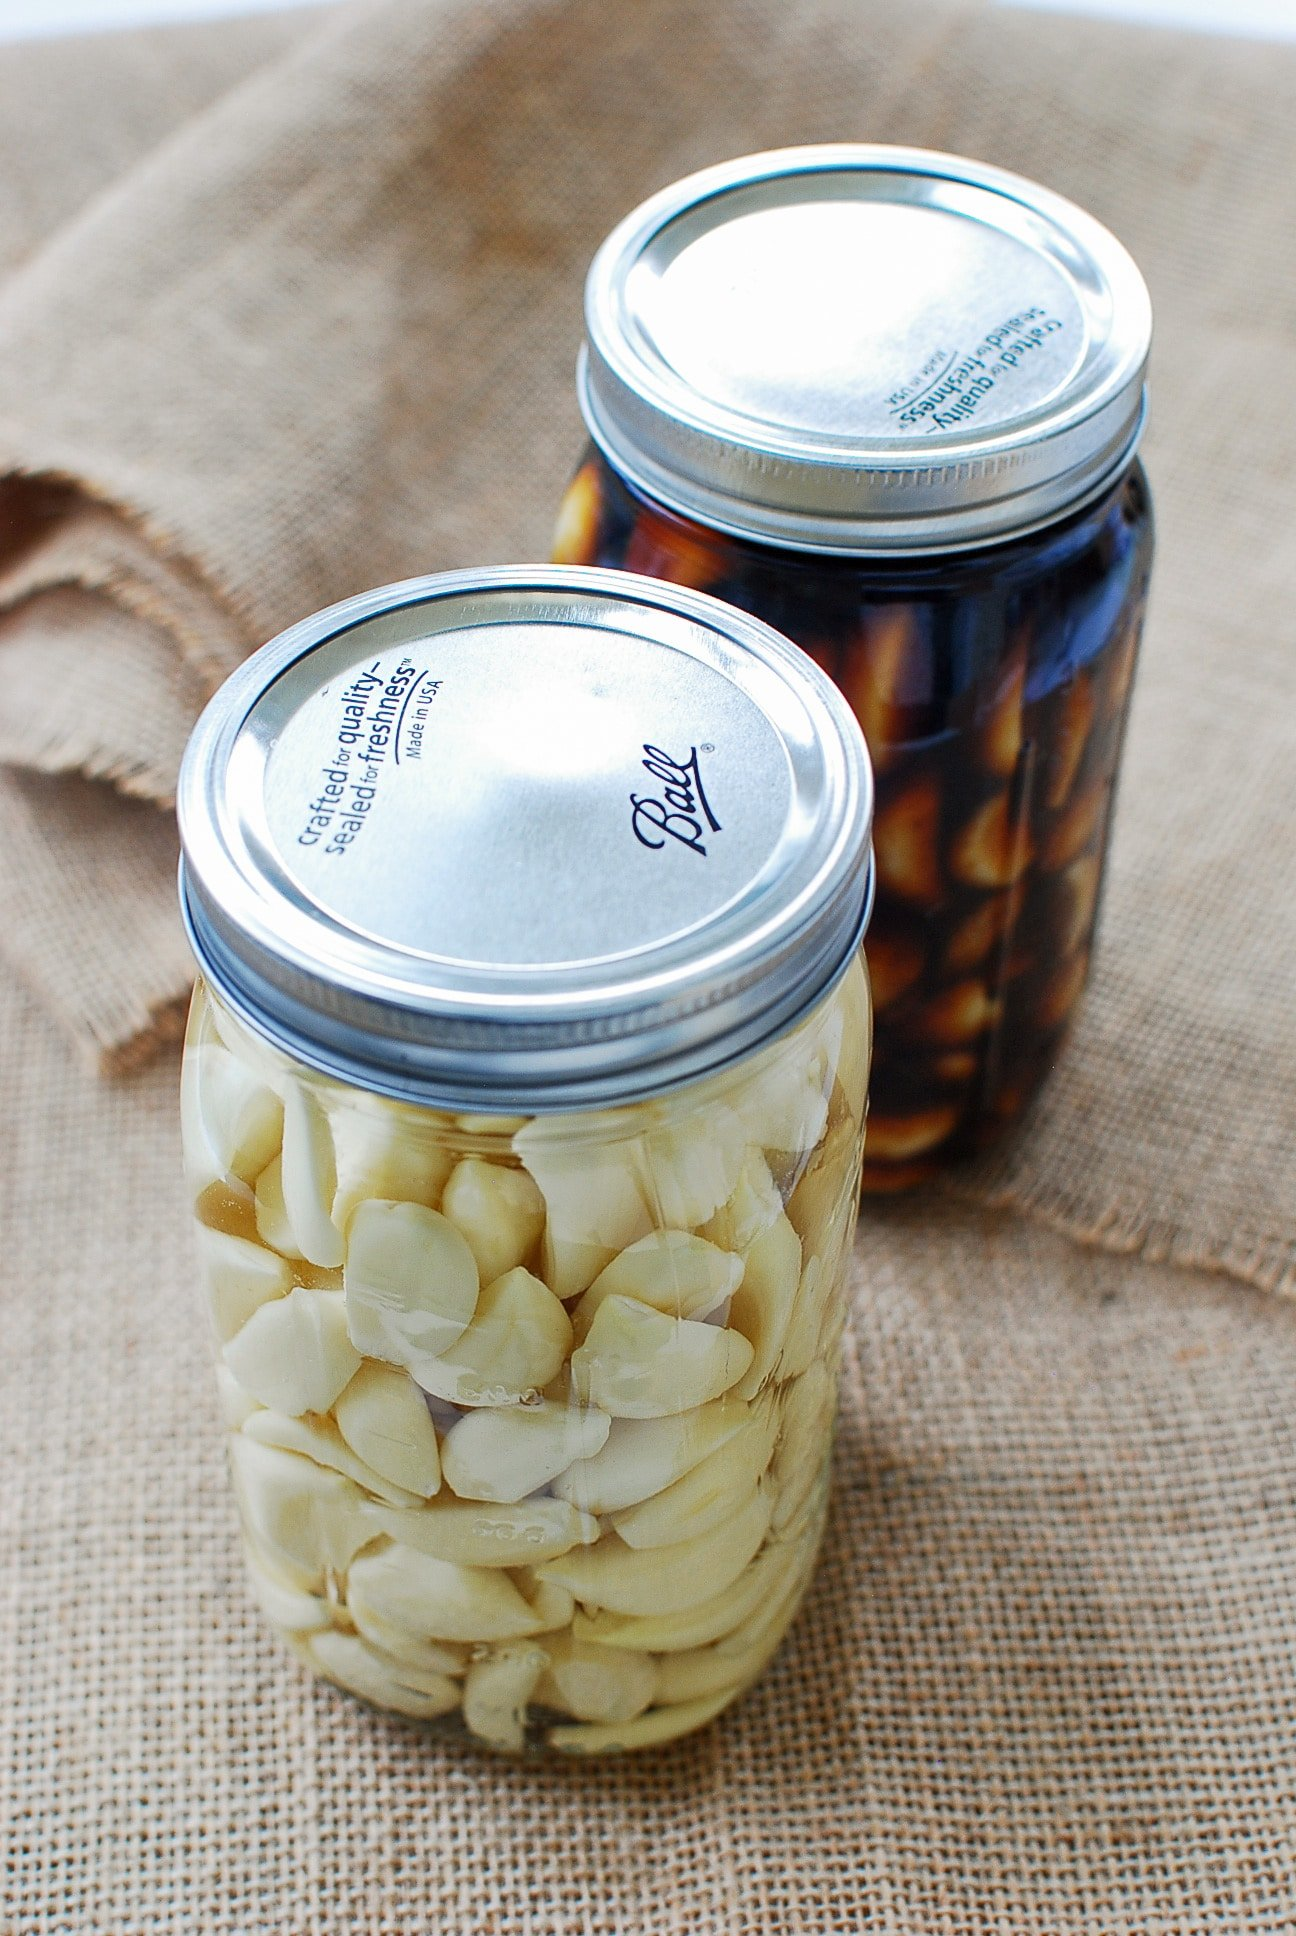 DSC 1227 1 - Pickled Garlic (Maneul Jangajji)